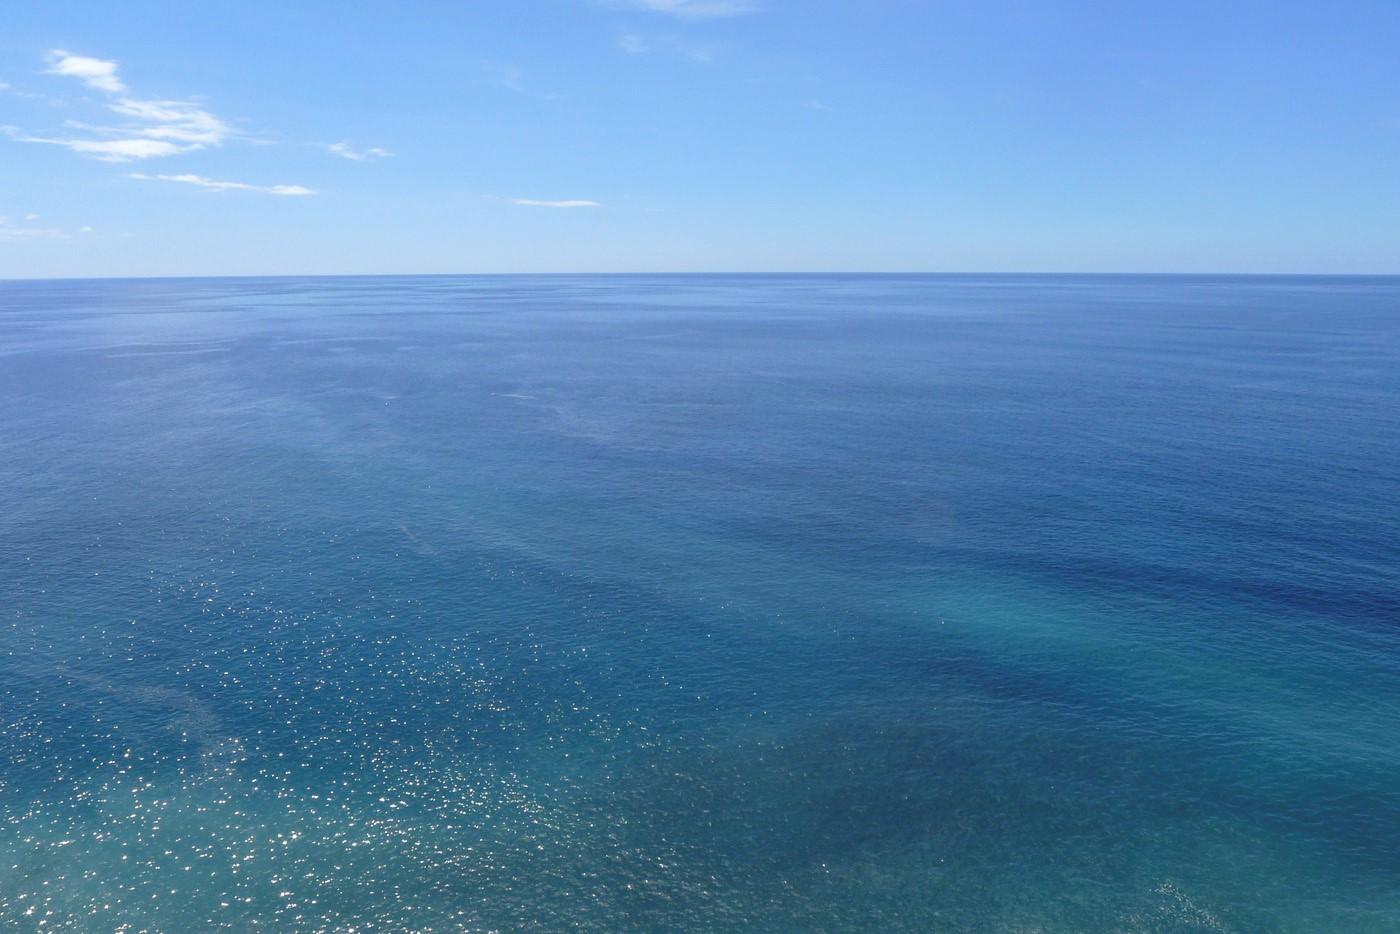 Blue, blue sea!